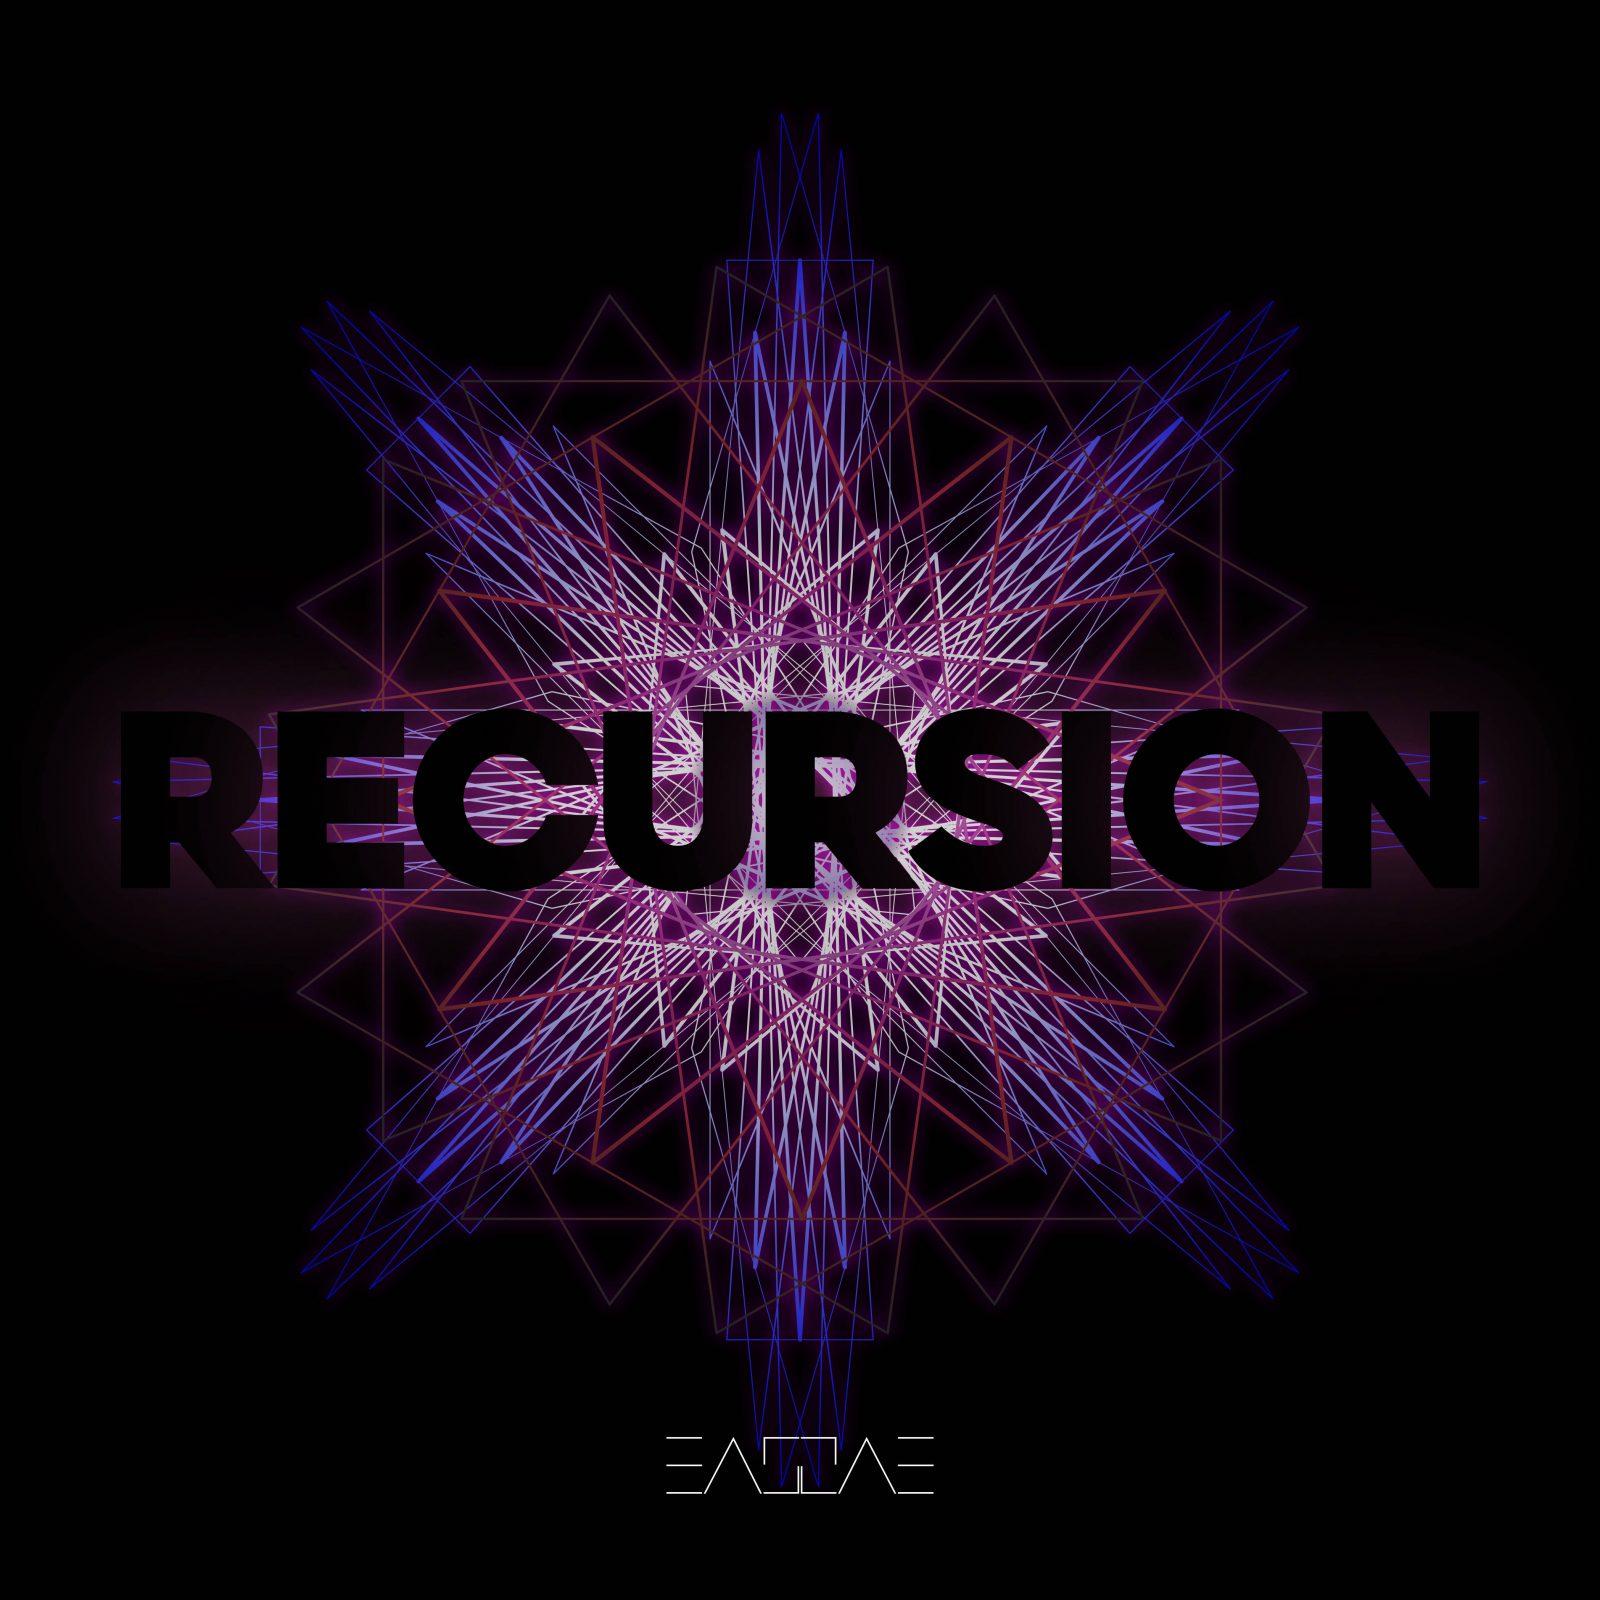 Recursion, a new album by eassae